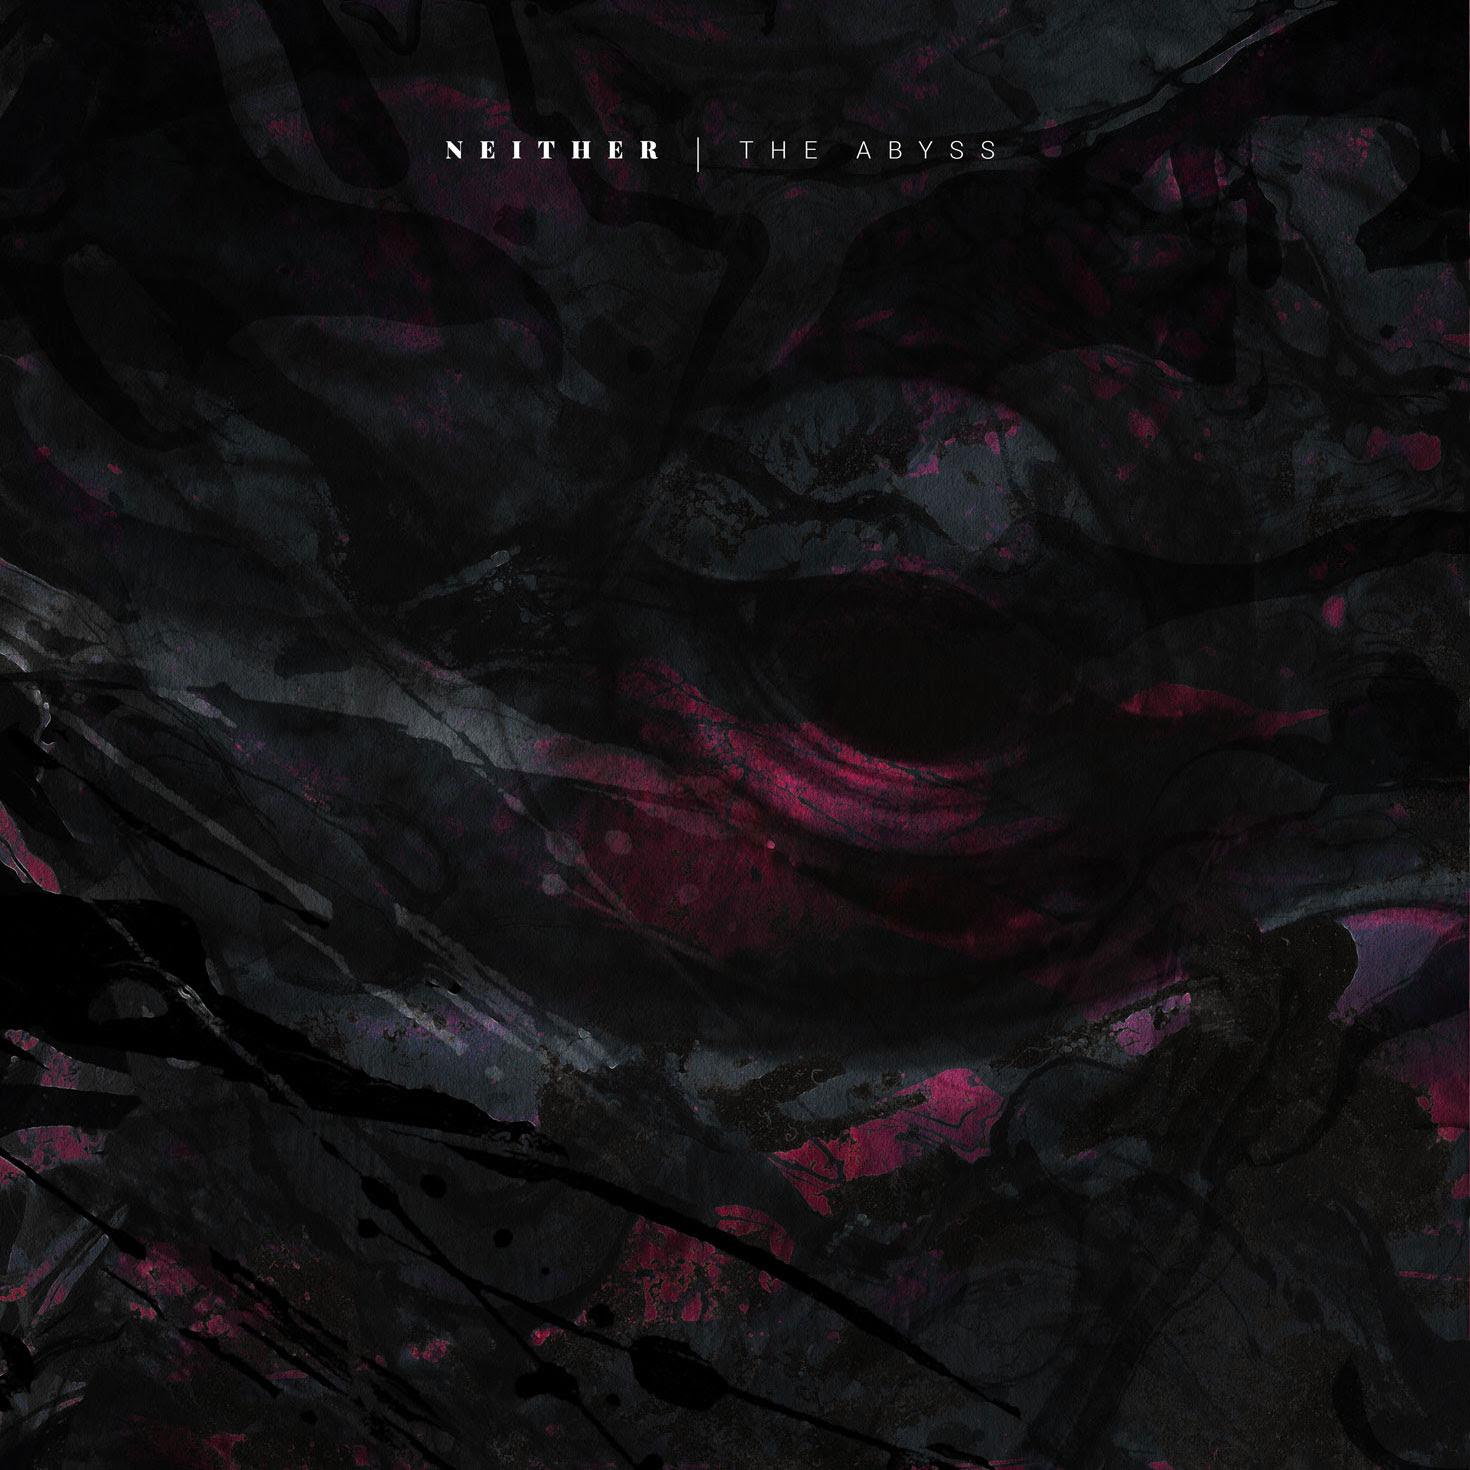 Neither - Album artwork